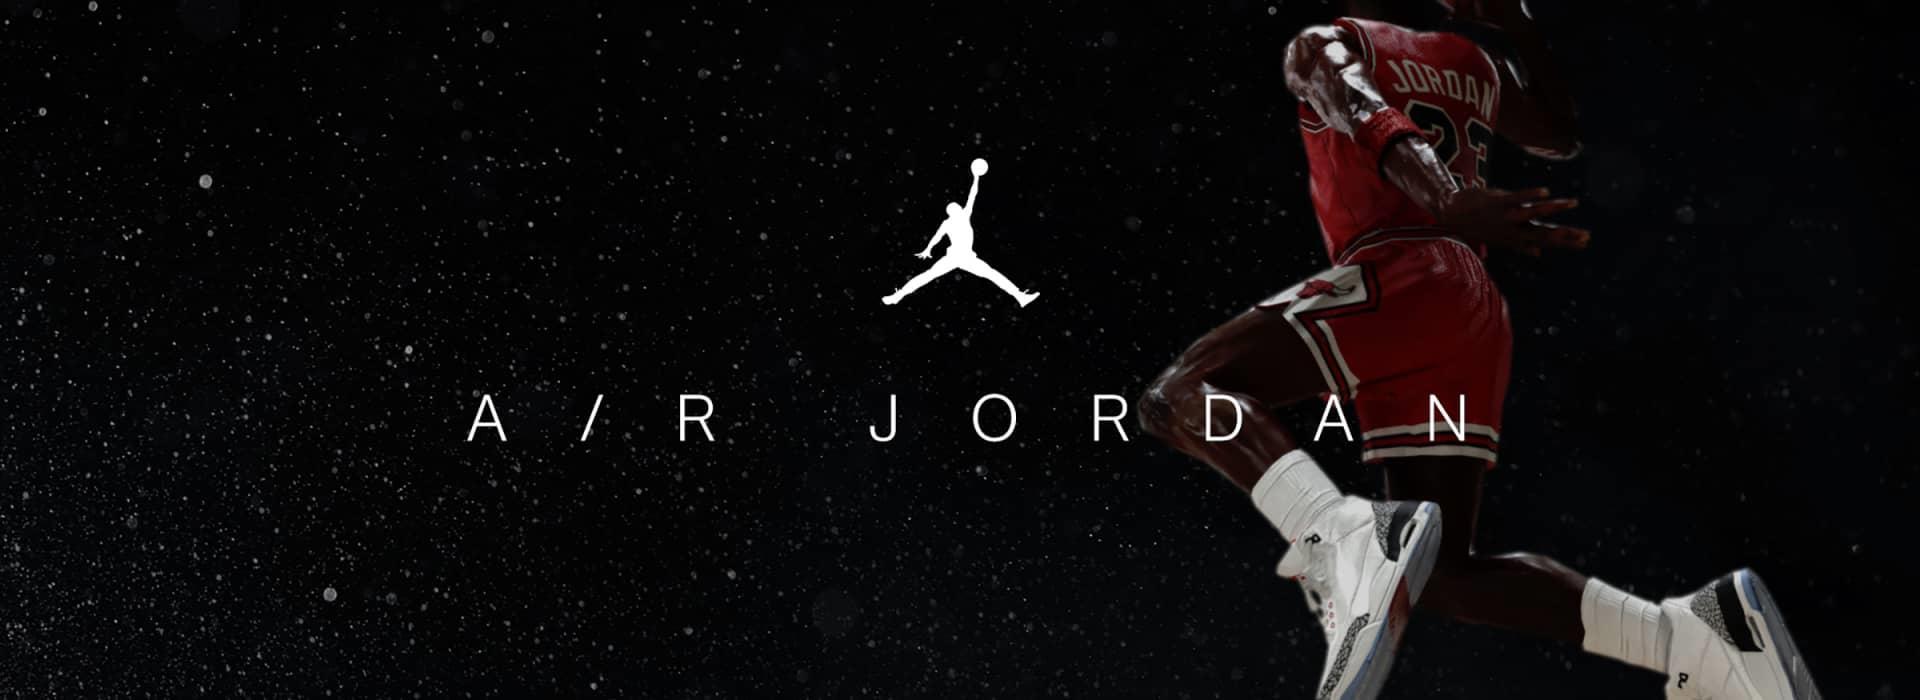 AR Jordan